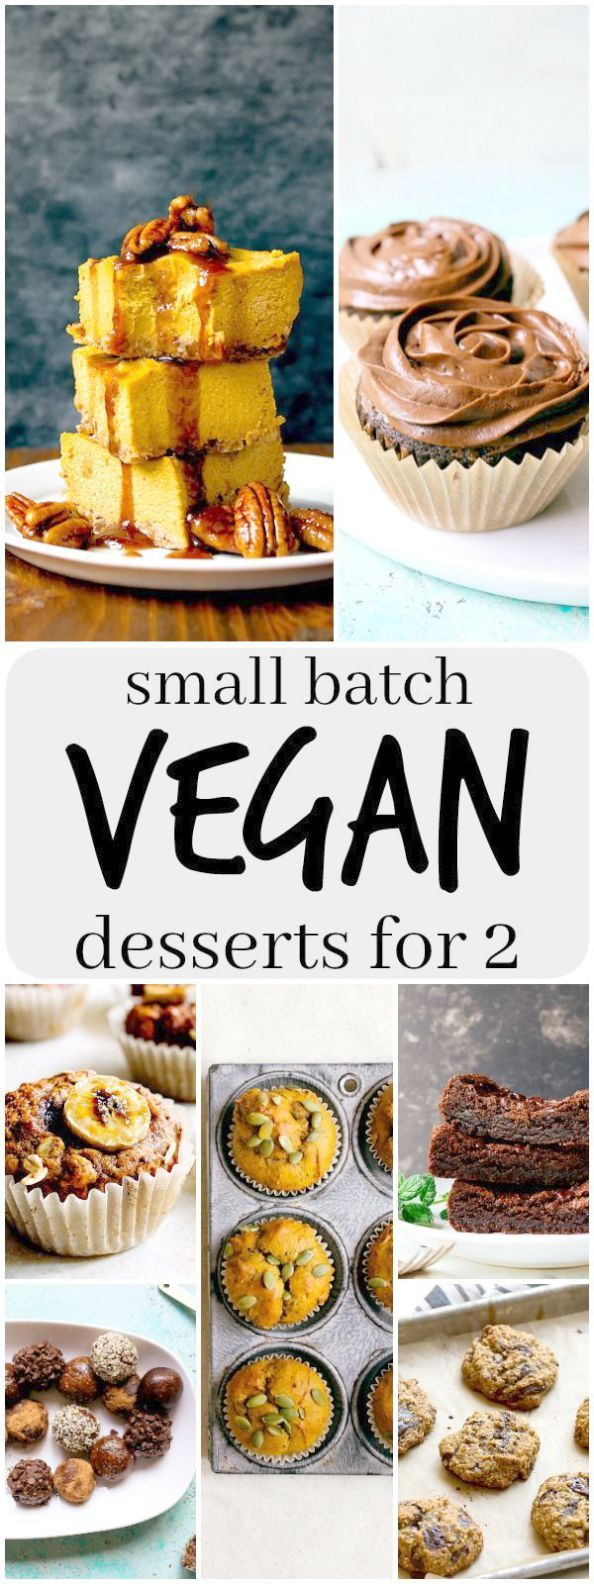 Desserts In Baton Rouge La Desserts To Make With Heavy Whipping Cream Desserts Reddit Vegan Desserts Dessert For Two Vegan Sweet Potato